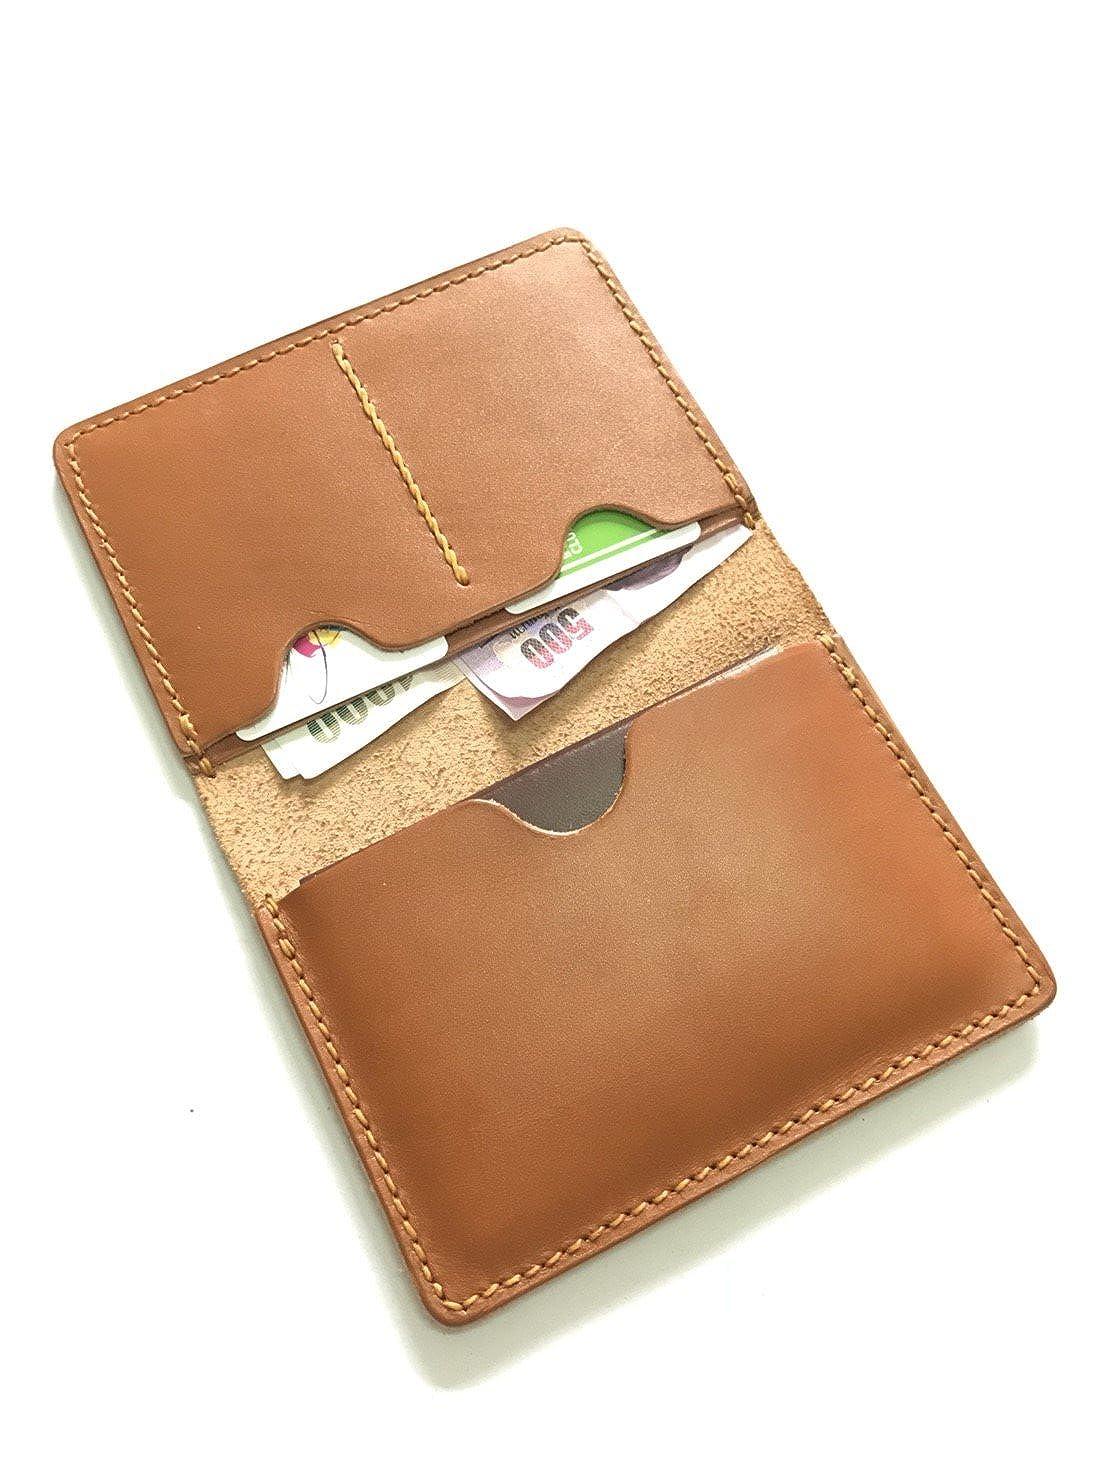 leather passport holder Passport Wallet leather travel wallet